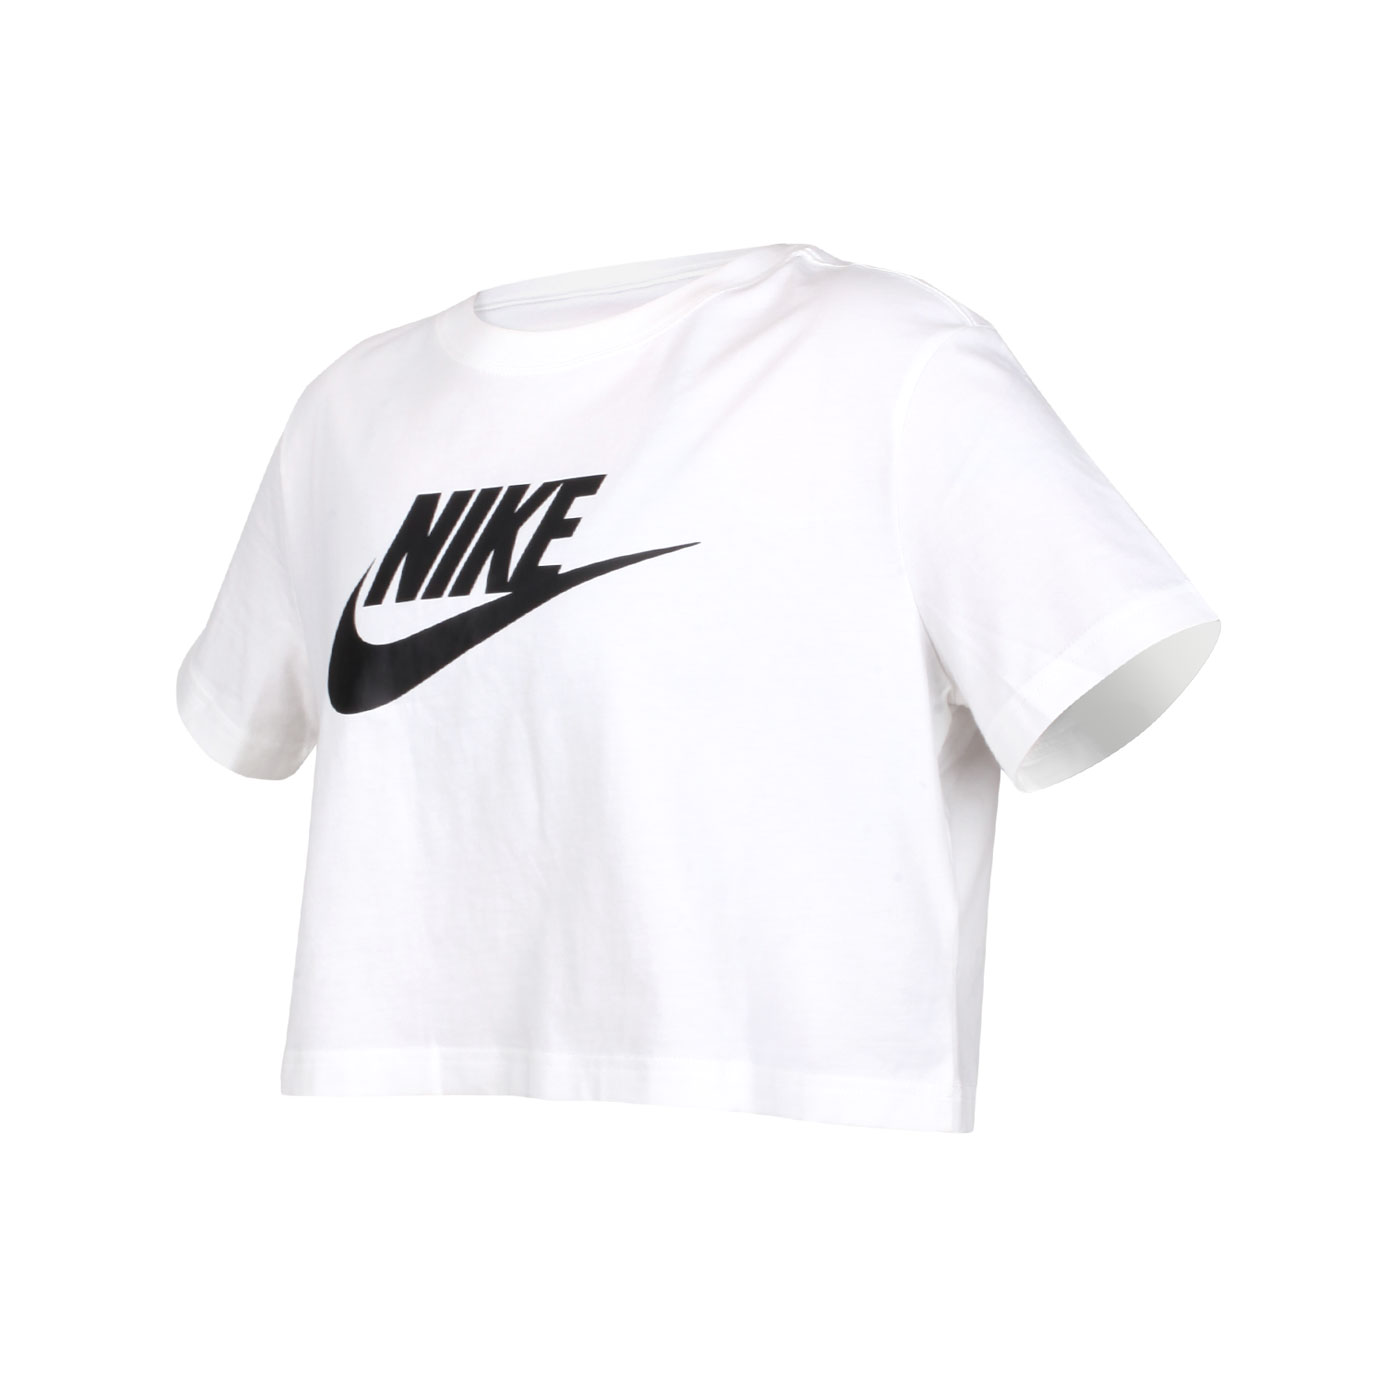 NIKE 女款短袖T恤 BV6176-100 - 白黑